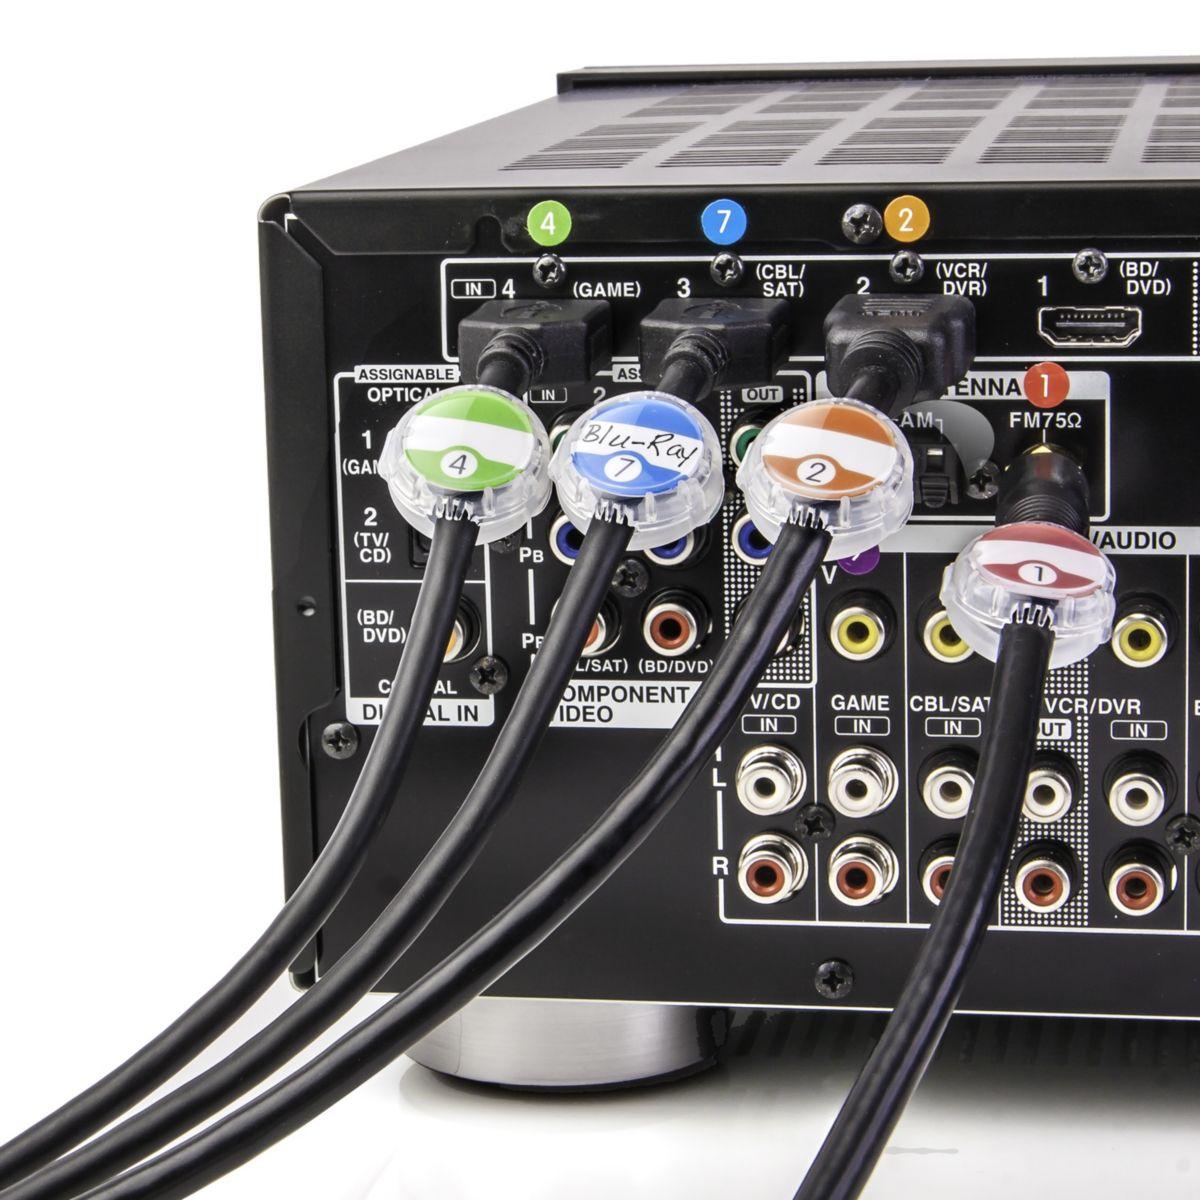 Dotz kit d'identif. câble pack de 12 (photo)